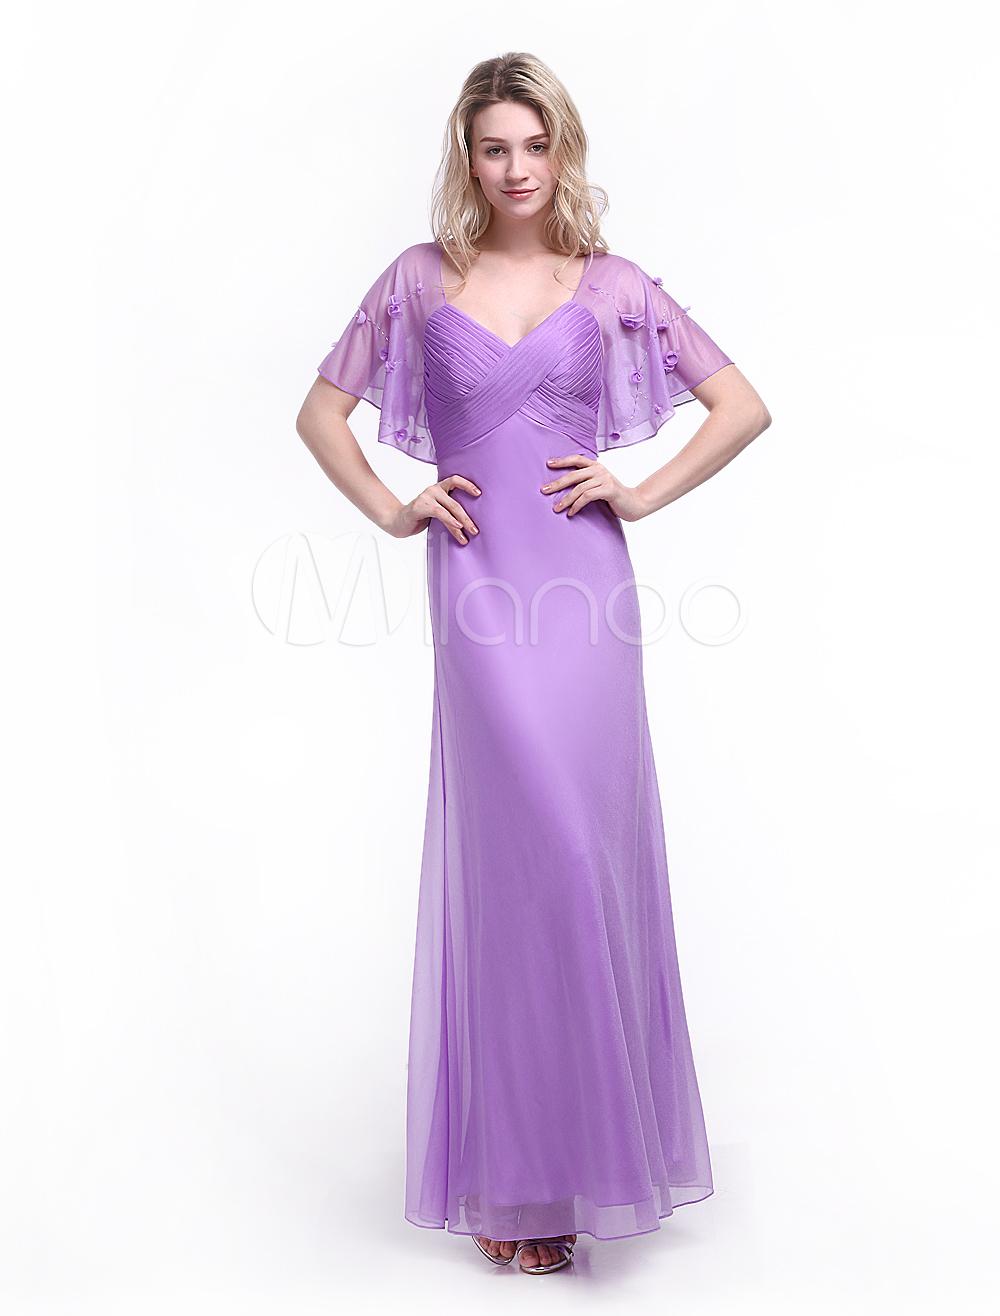 Lilac Evening Dress Beading Scoop Neck Short Sleeves Sheath Party Dress Milanoo (Wedding Evening Dresses) photo